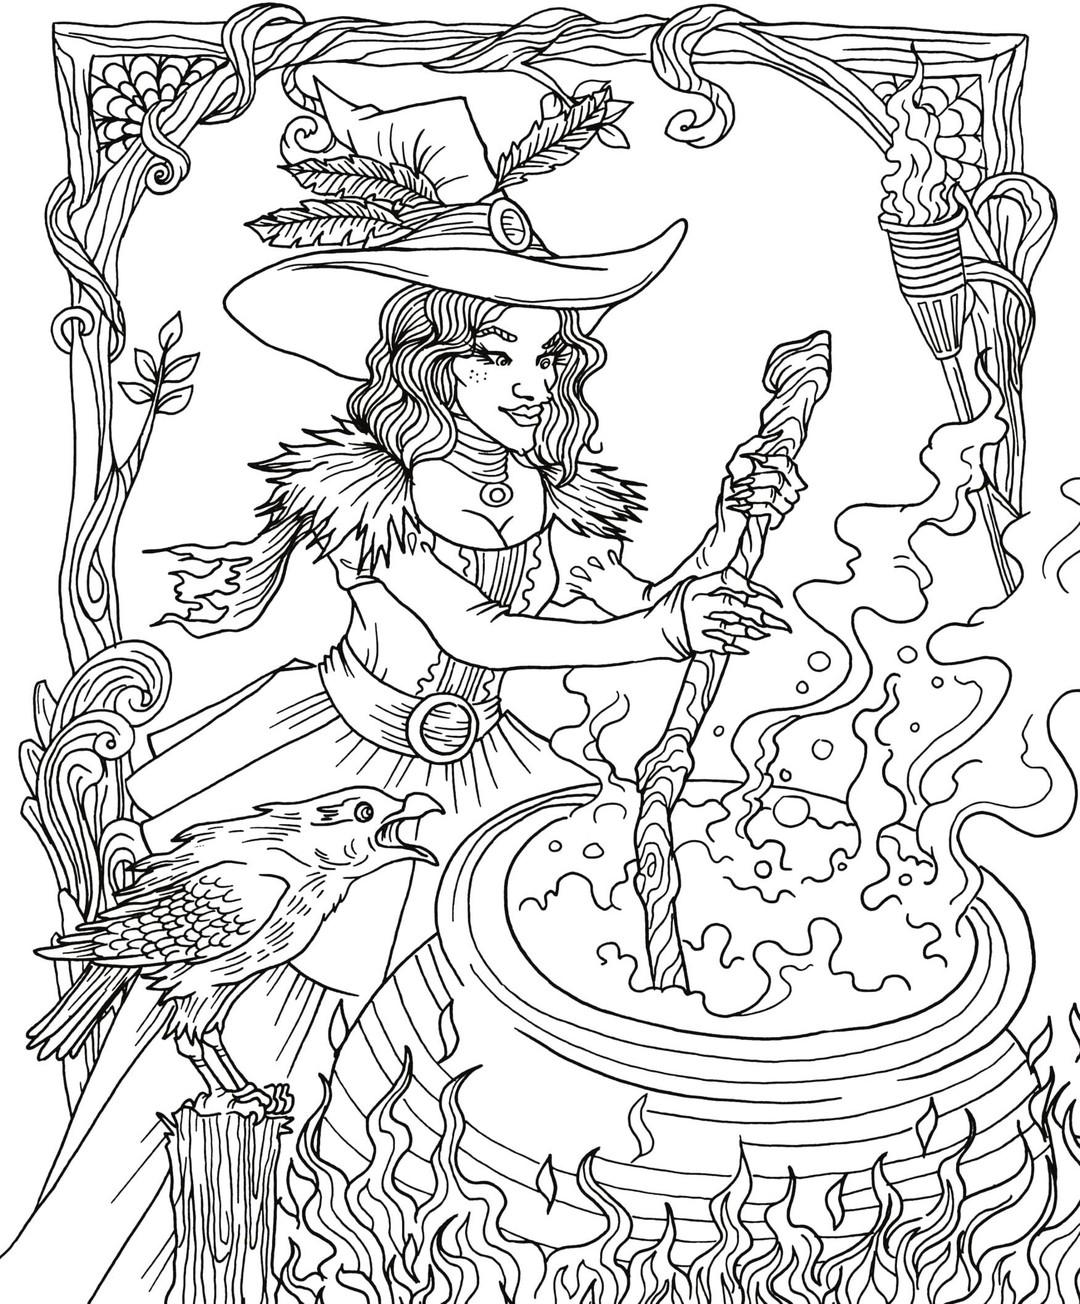 Mythical & Fantasy